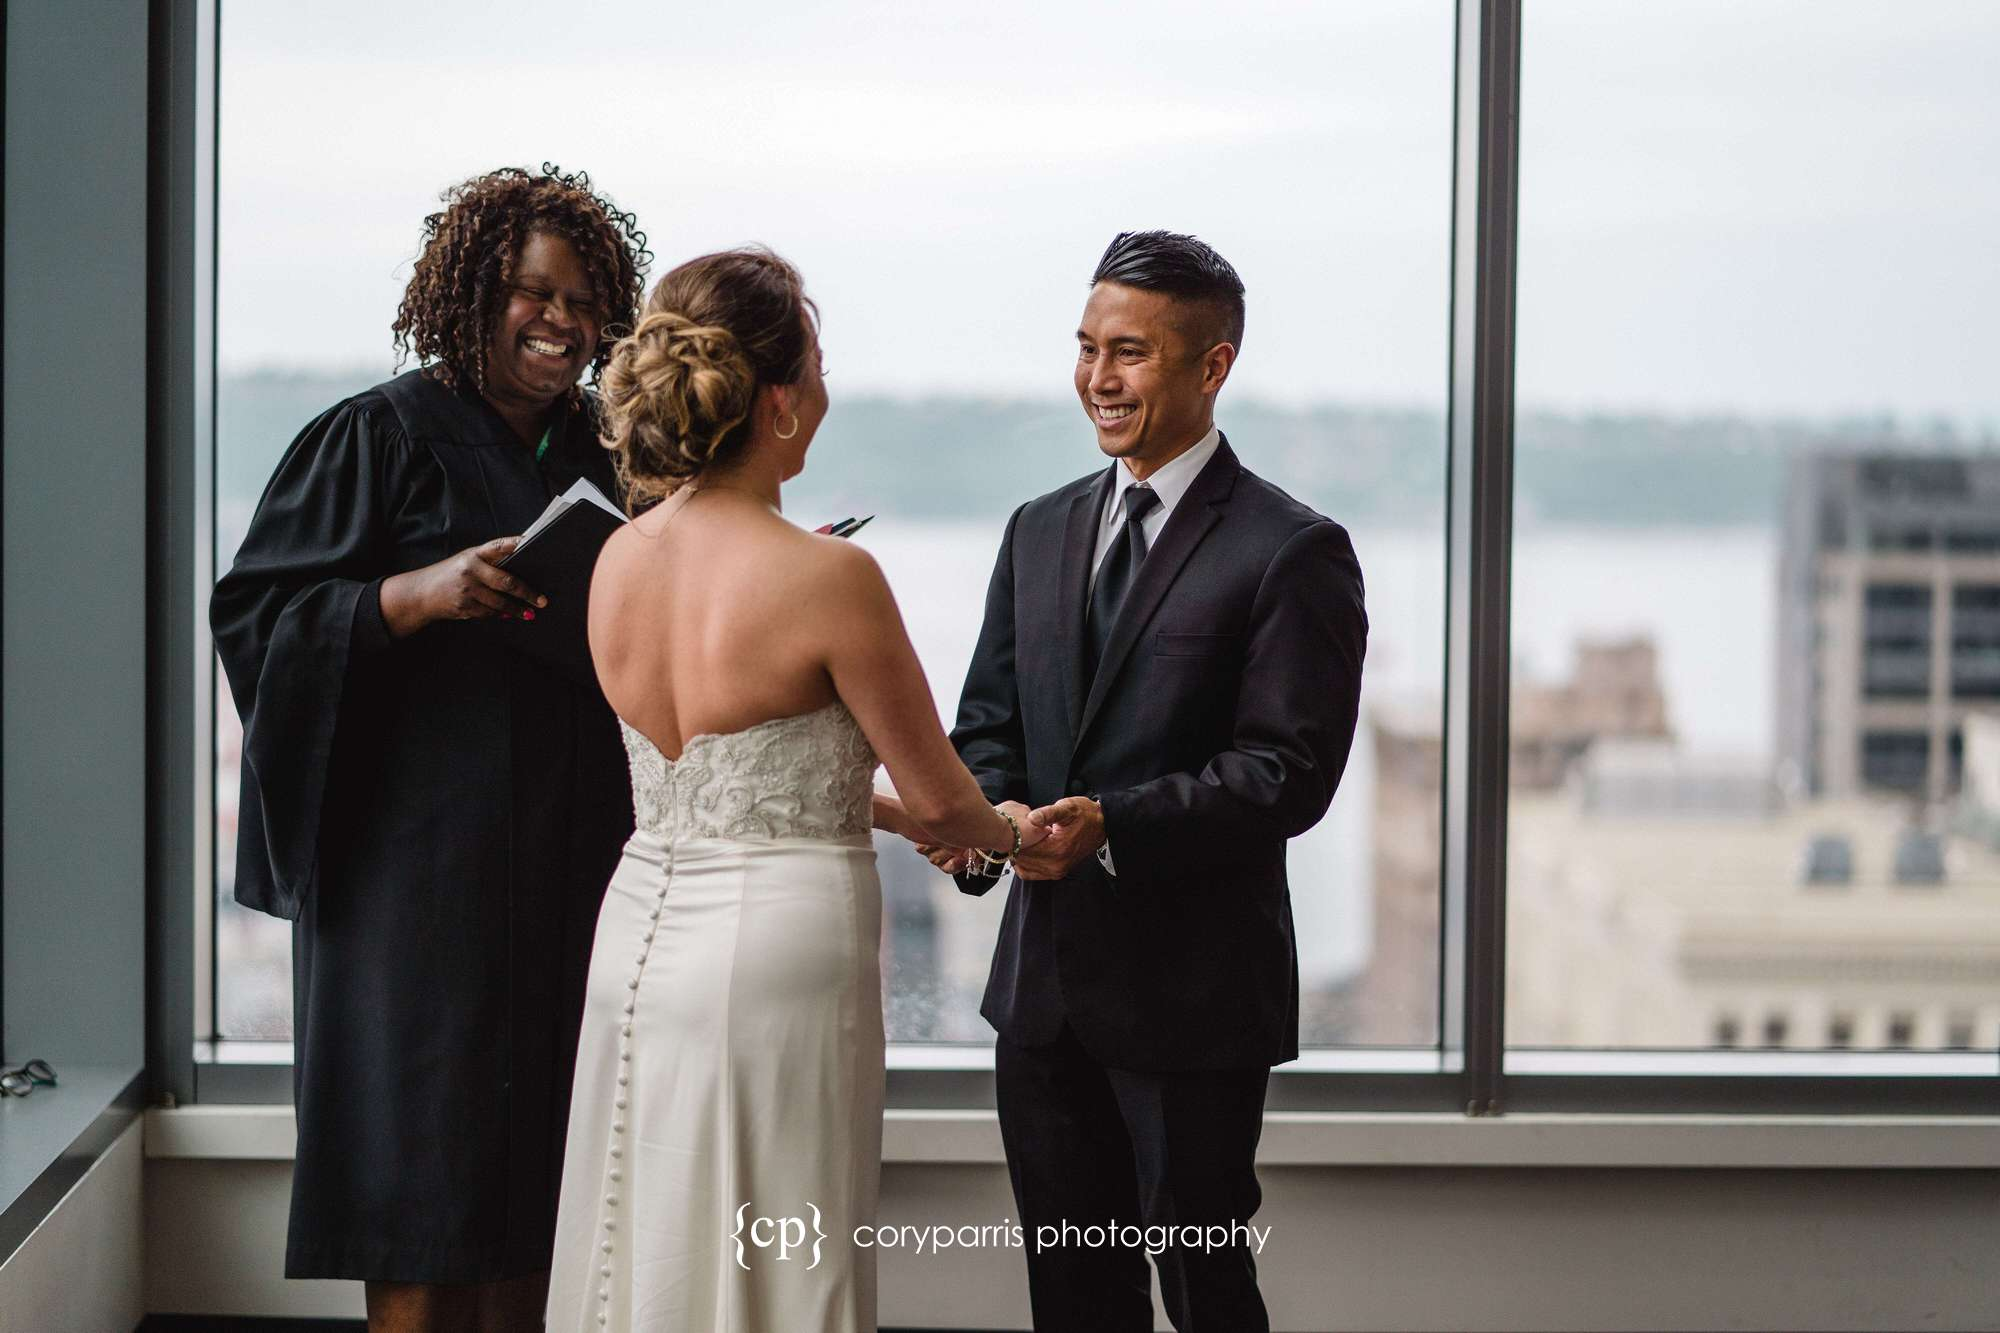 295-seattle-courthouse-wedding-photography.jpg